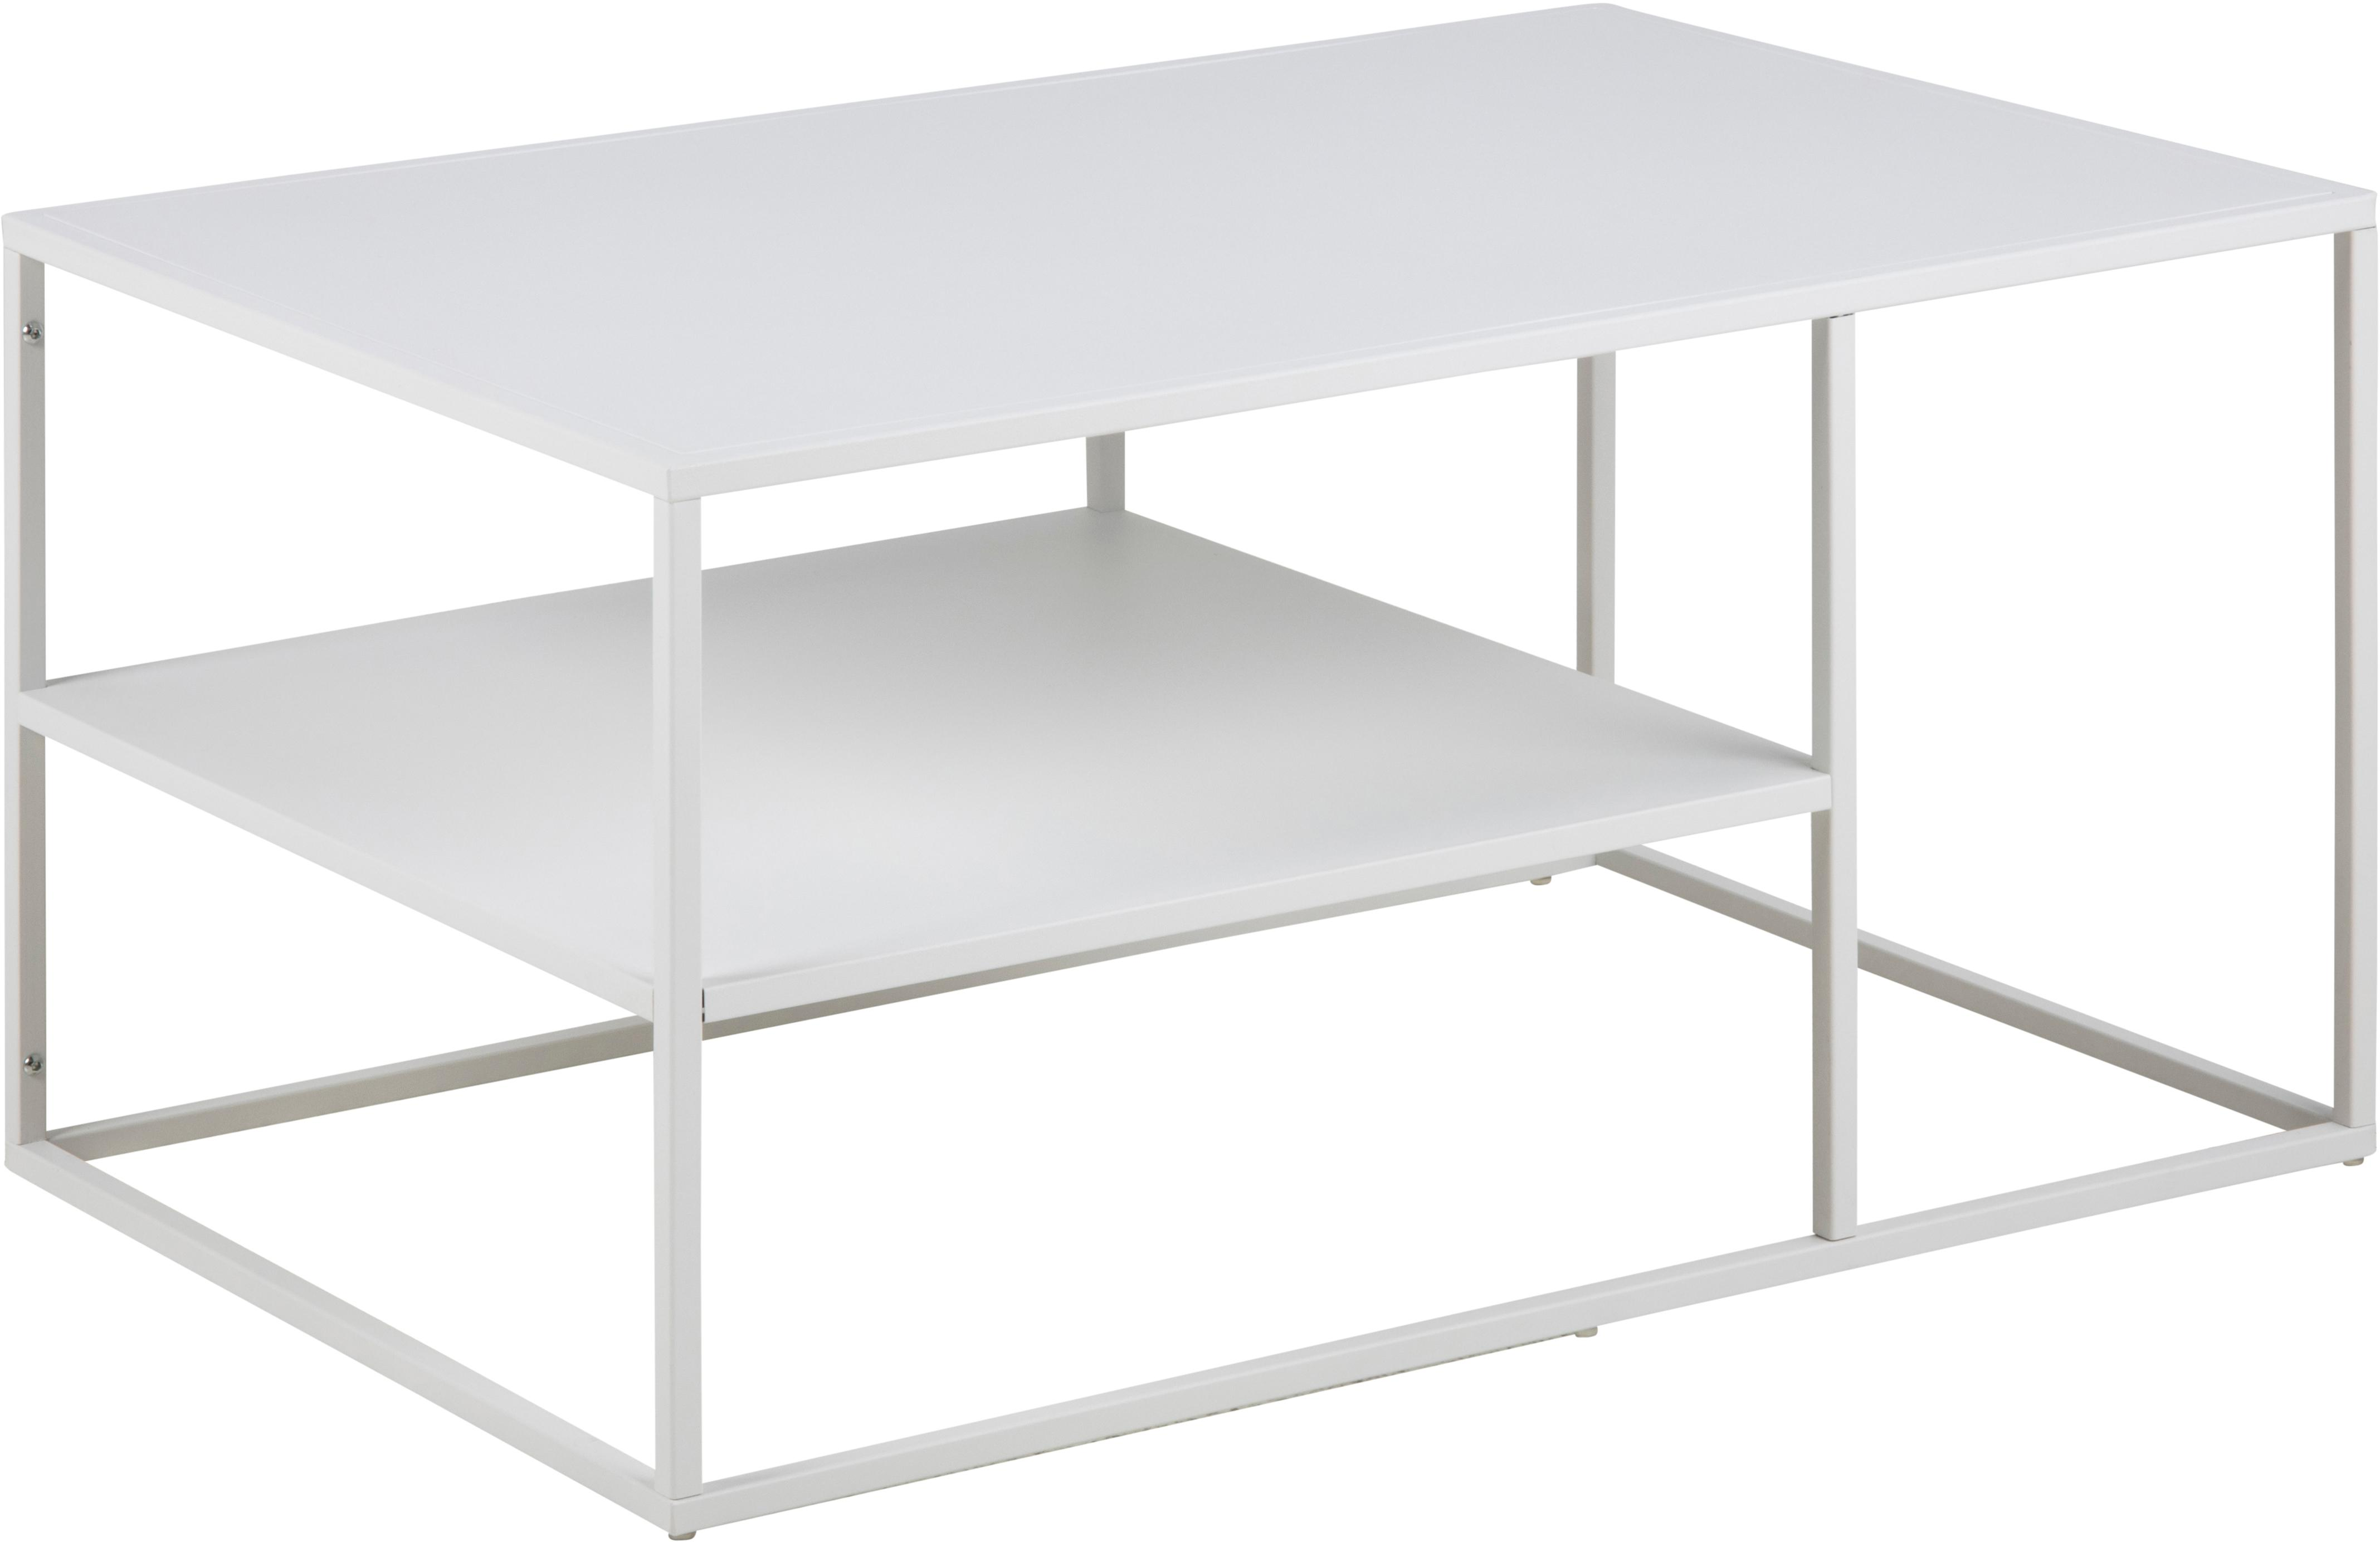 Mesa de centro de metal Newton, Metal con pintura en polvo, Blanco, An 90 x Al 45 cm